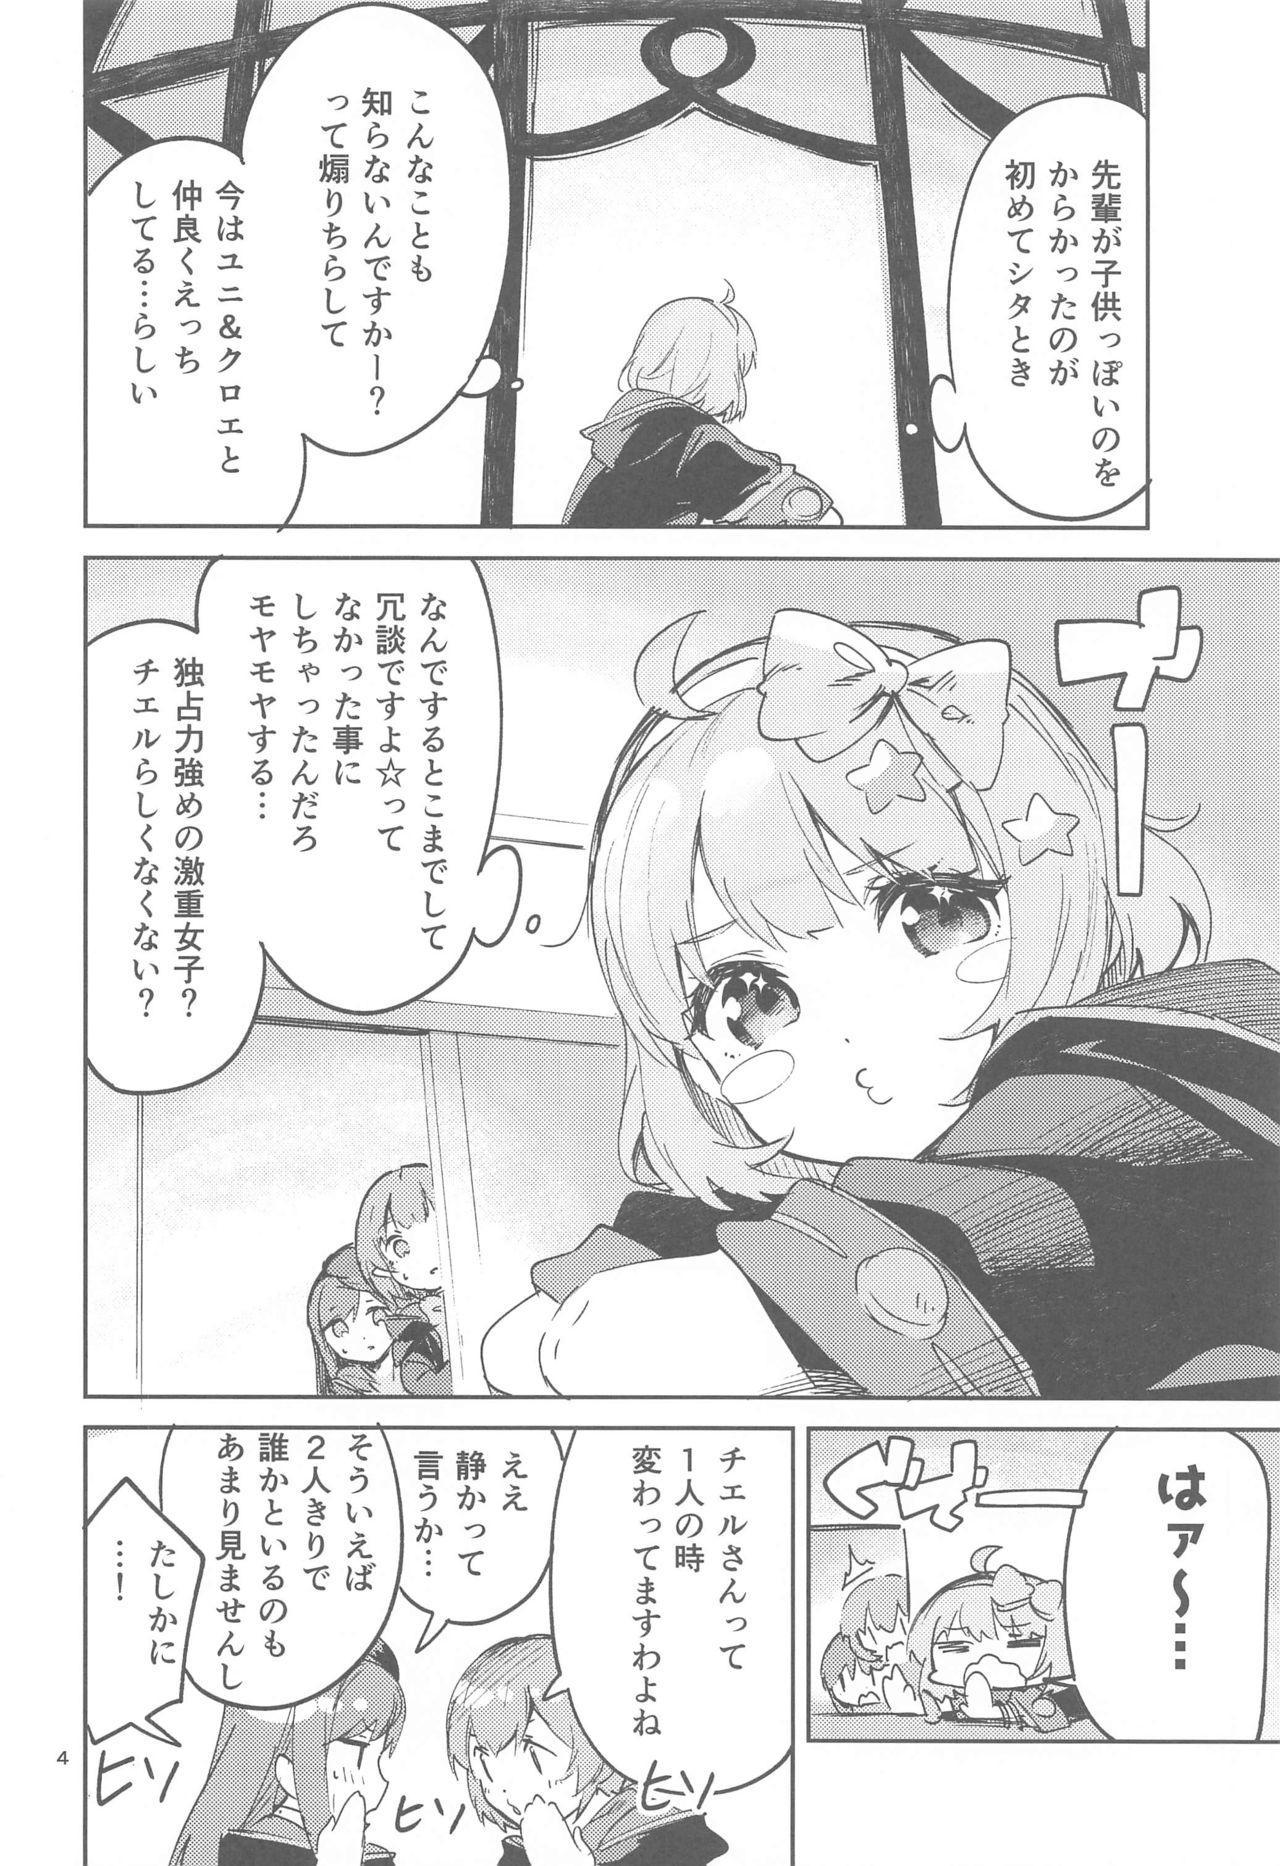 Seishun Dokusenbi 2